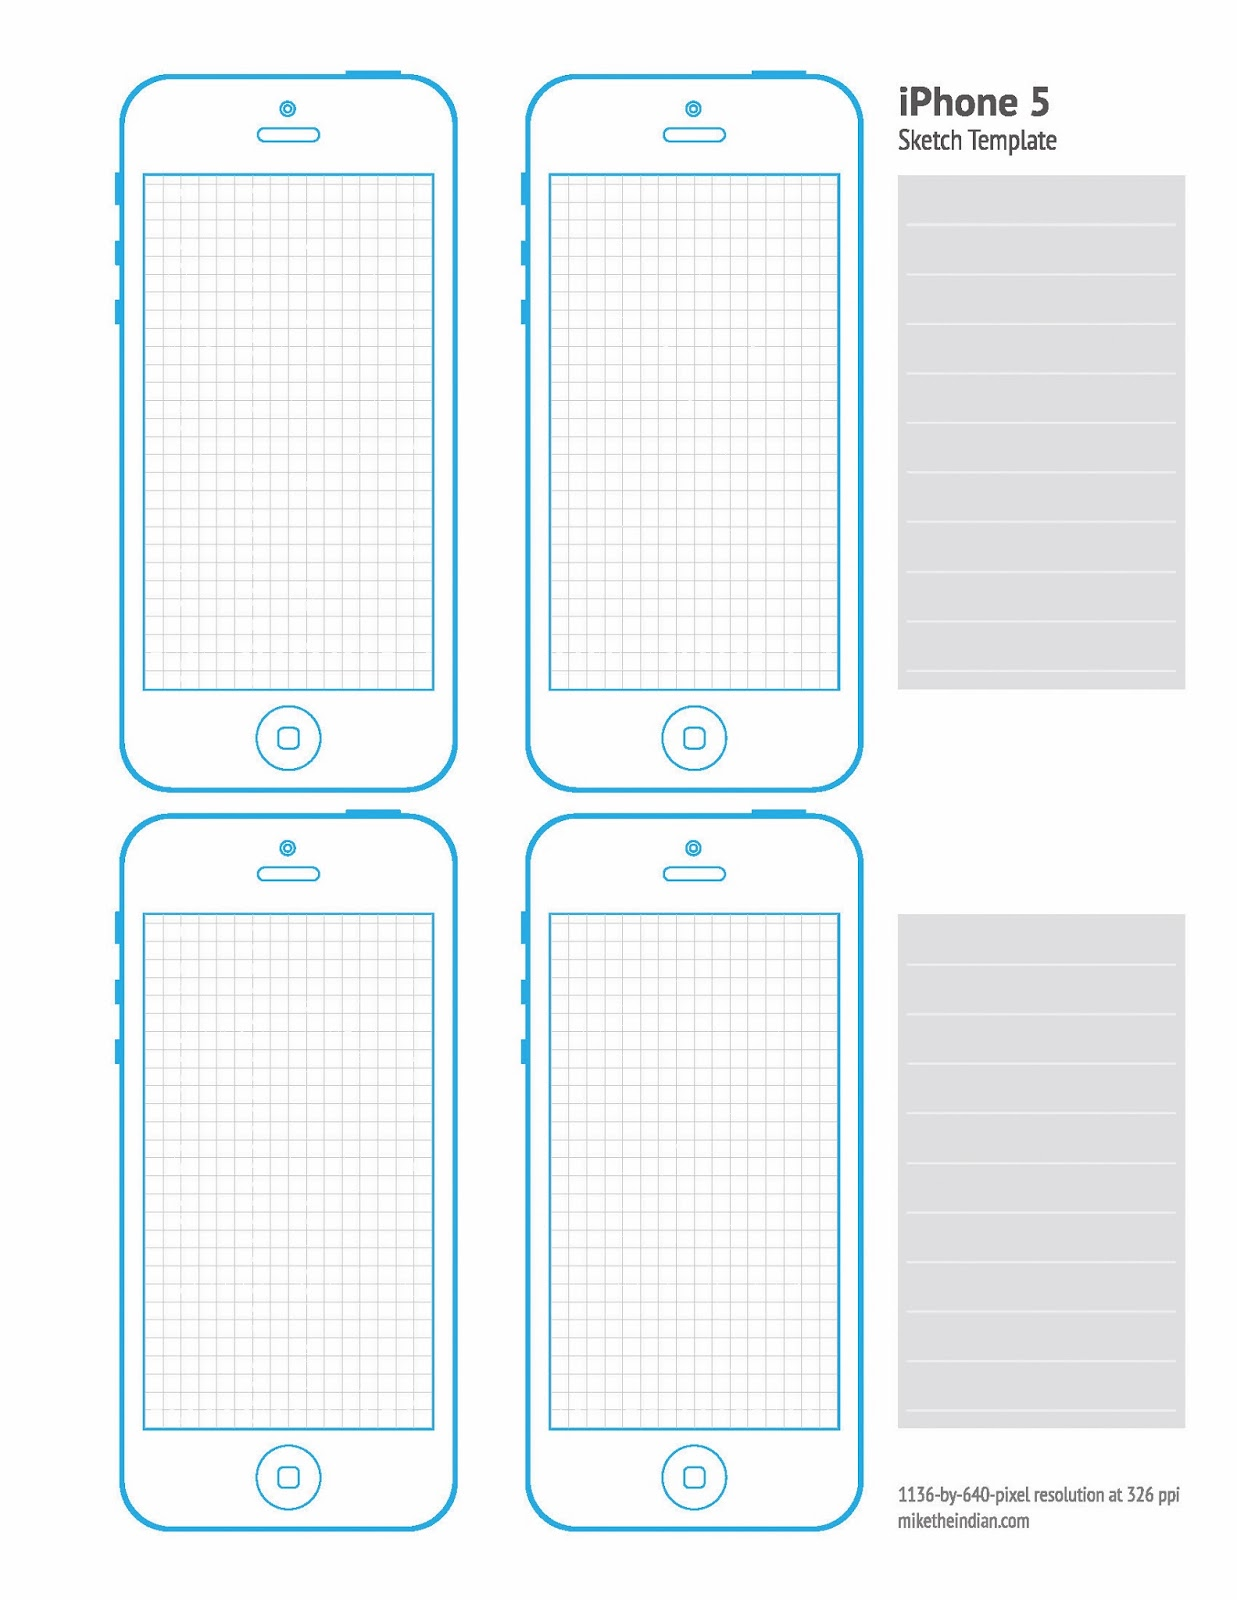 arts 3362 interactive design sketch templates. Black Bedroom Furniture Sets. Home Design Ideas